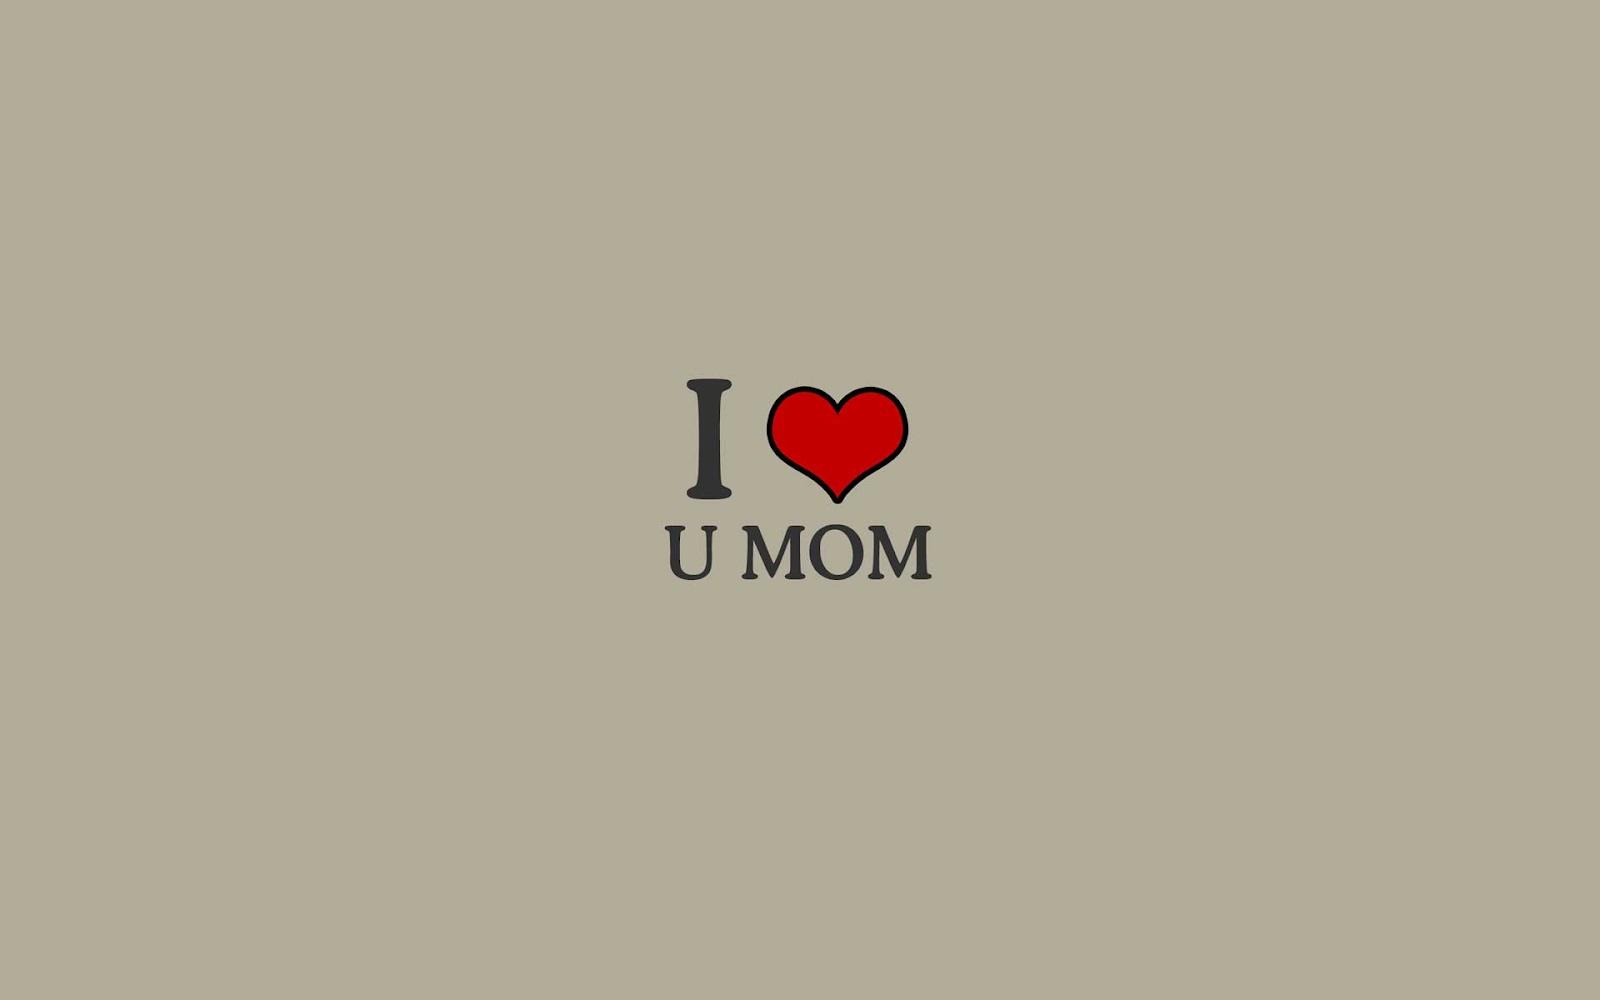 Free Download Love You Mom Desktop Wallpapers Desktop Background